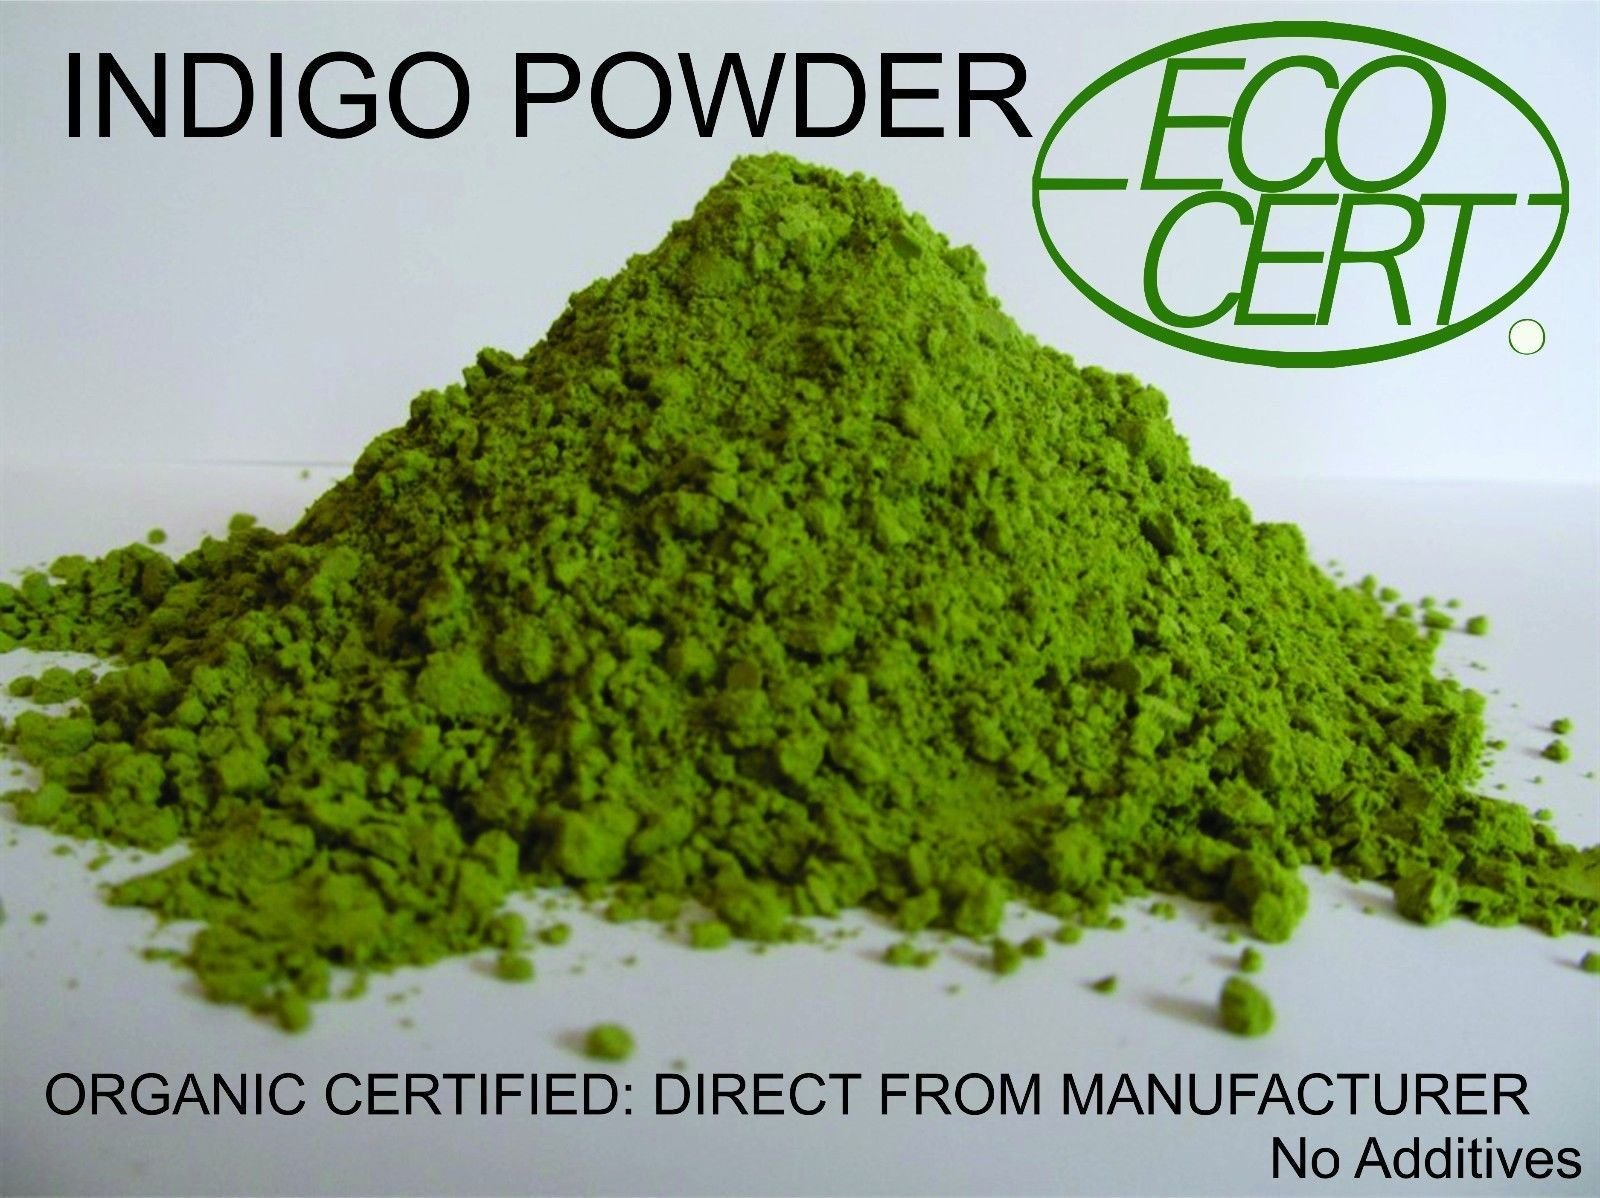 INDIGO POWDER ORGANIC CERTIFIED 500 gms Direct from Manufacturer 2019 Crop Premium by MITTAL AYURVED SANSTHAN